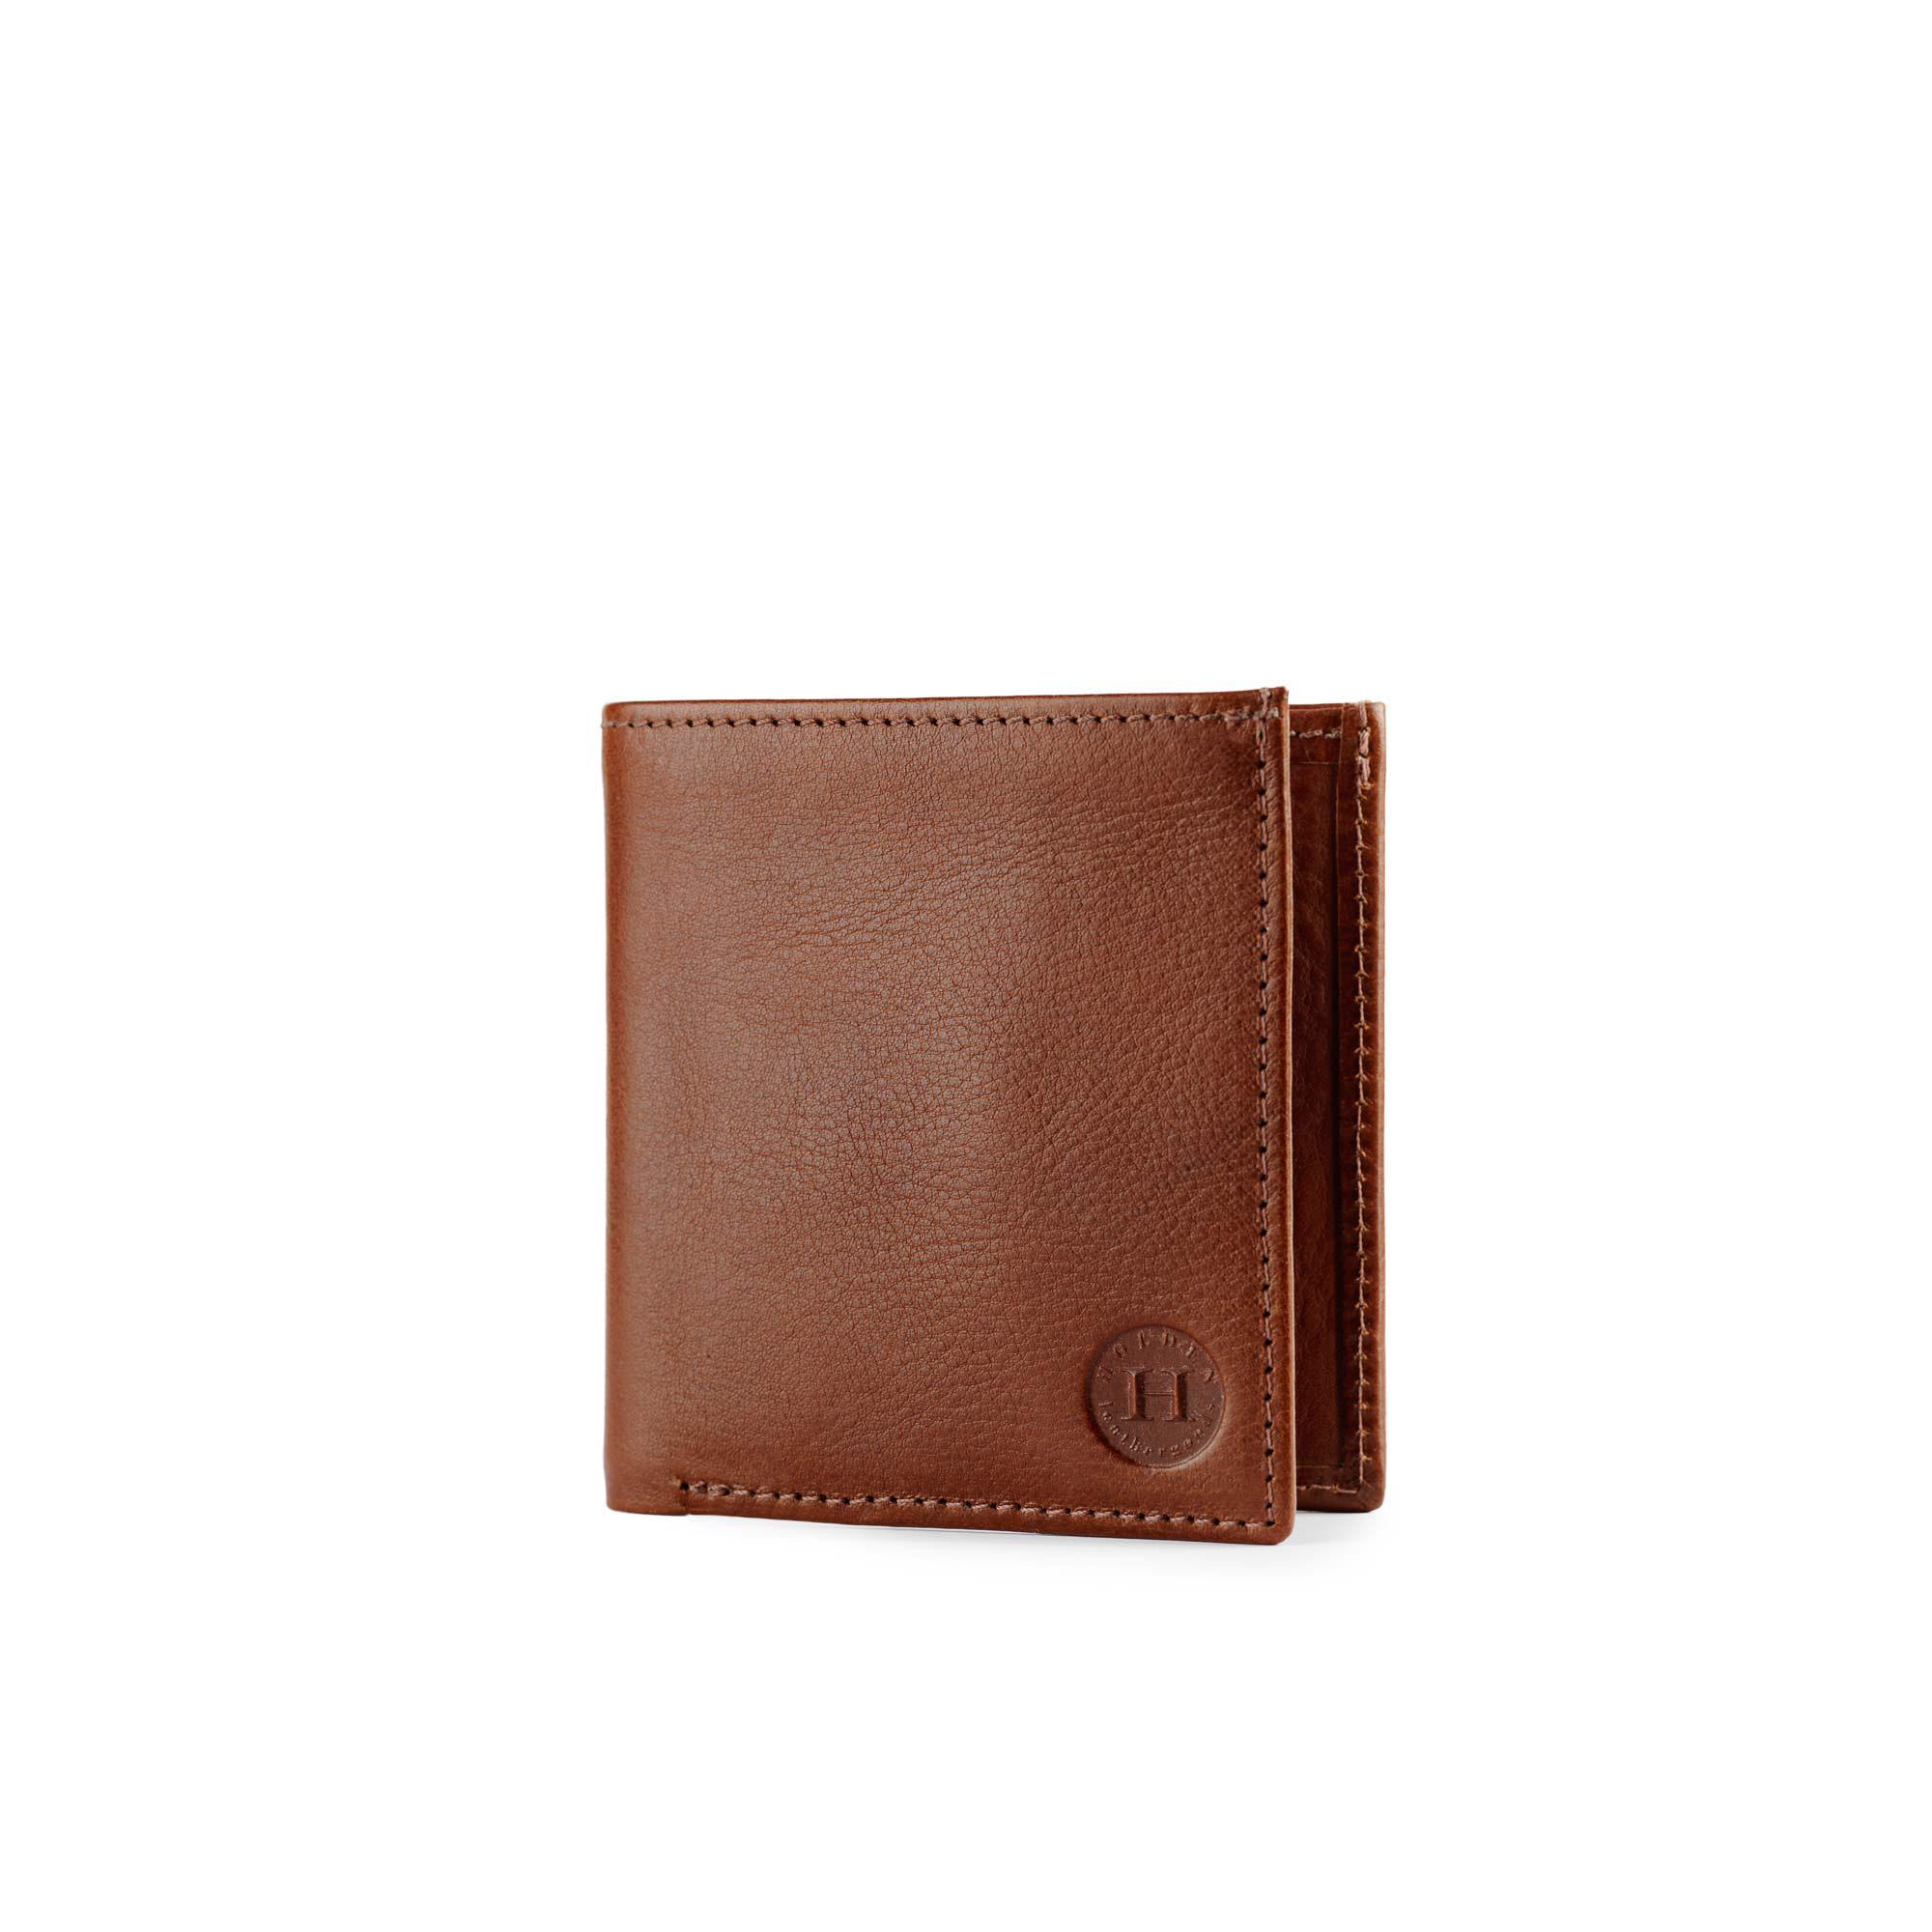 Holden-10-Card-Leather-Wallet-Chestnut QC.jpg